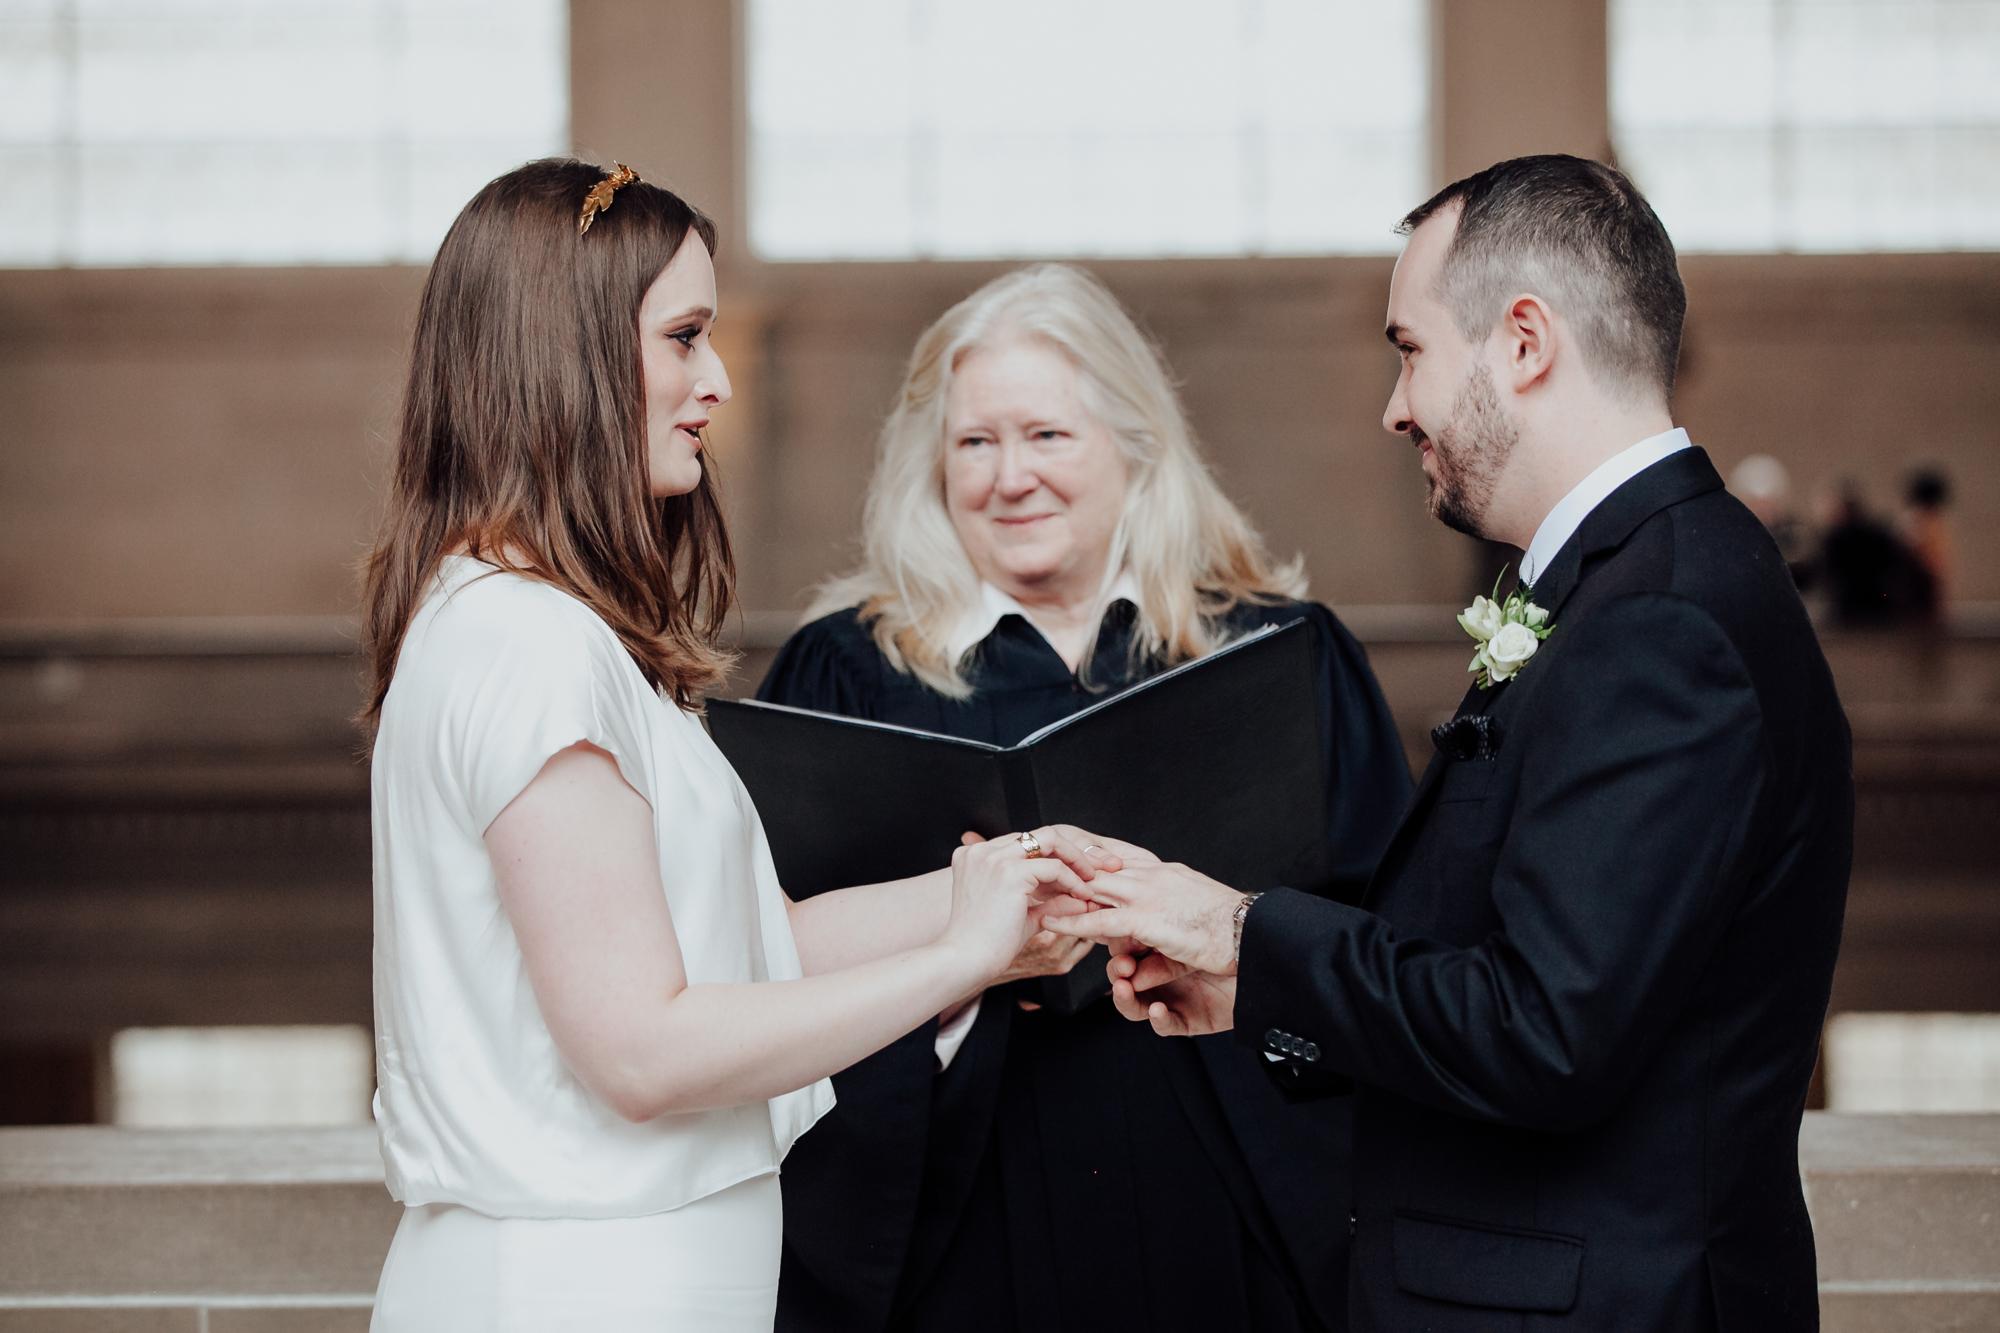 san-francisco-city-hall-wedding-marble-rye-photography-011721.JPG